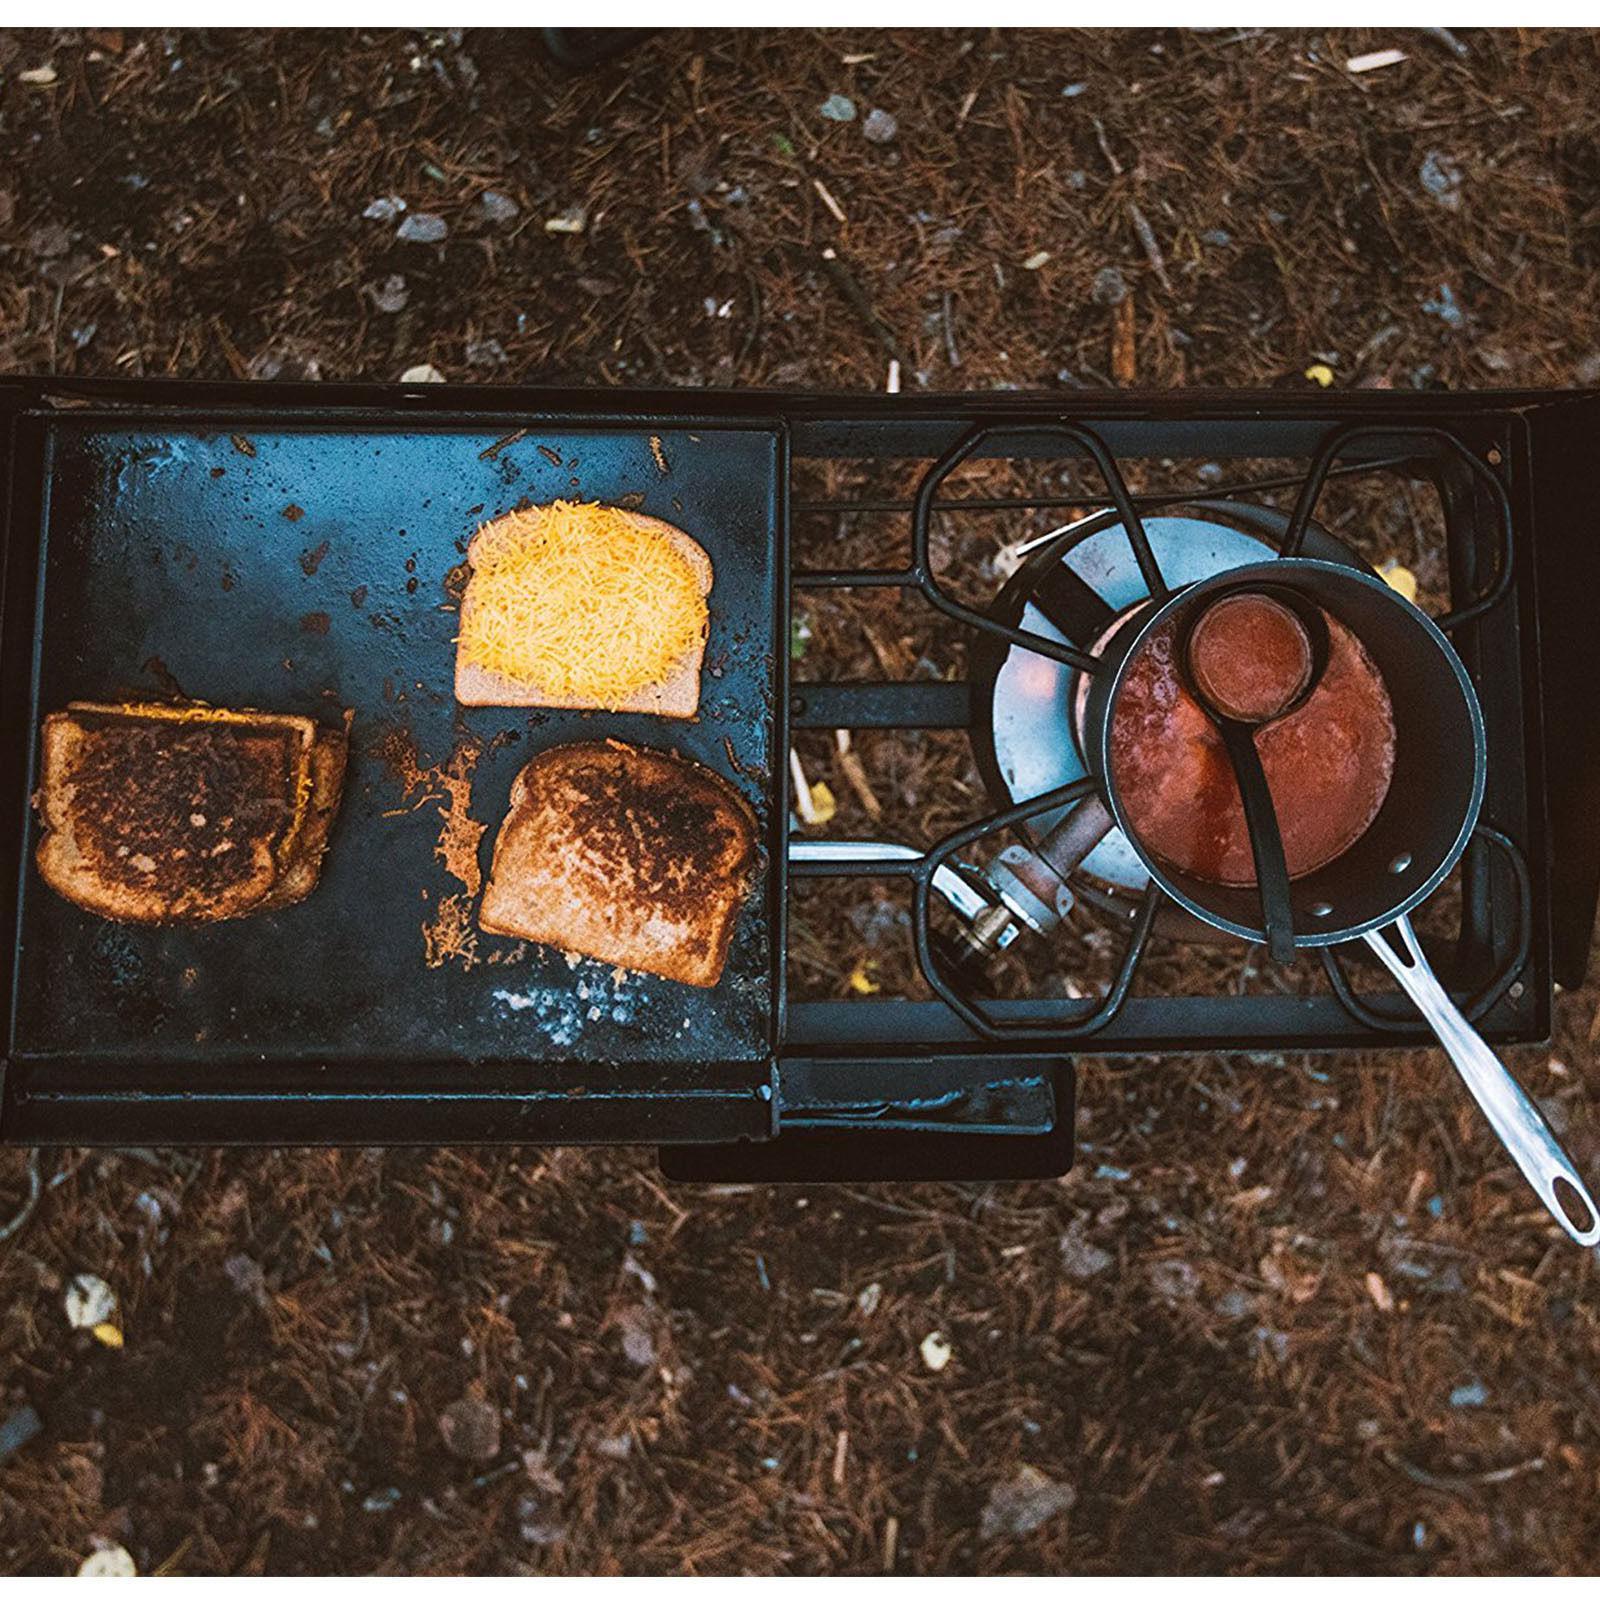 2 Propane Stove Camping Camp Grill Barbecue